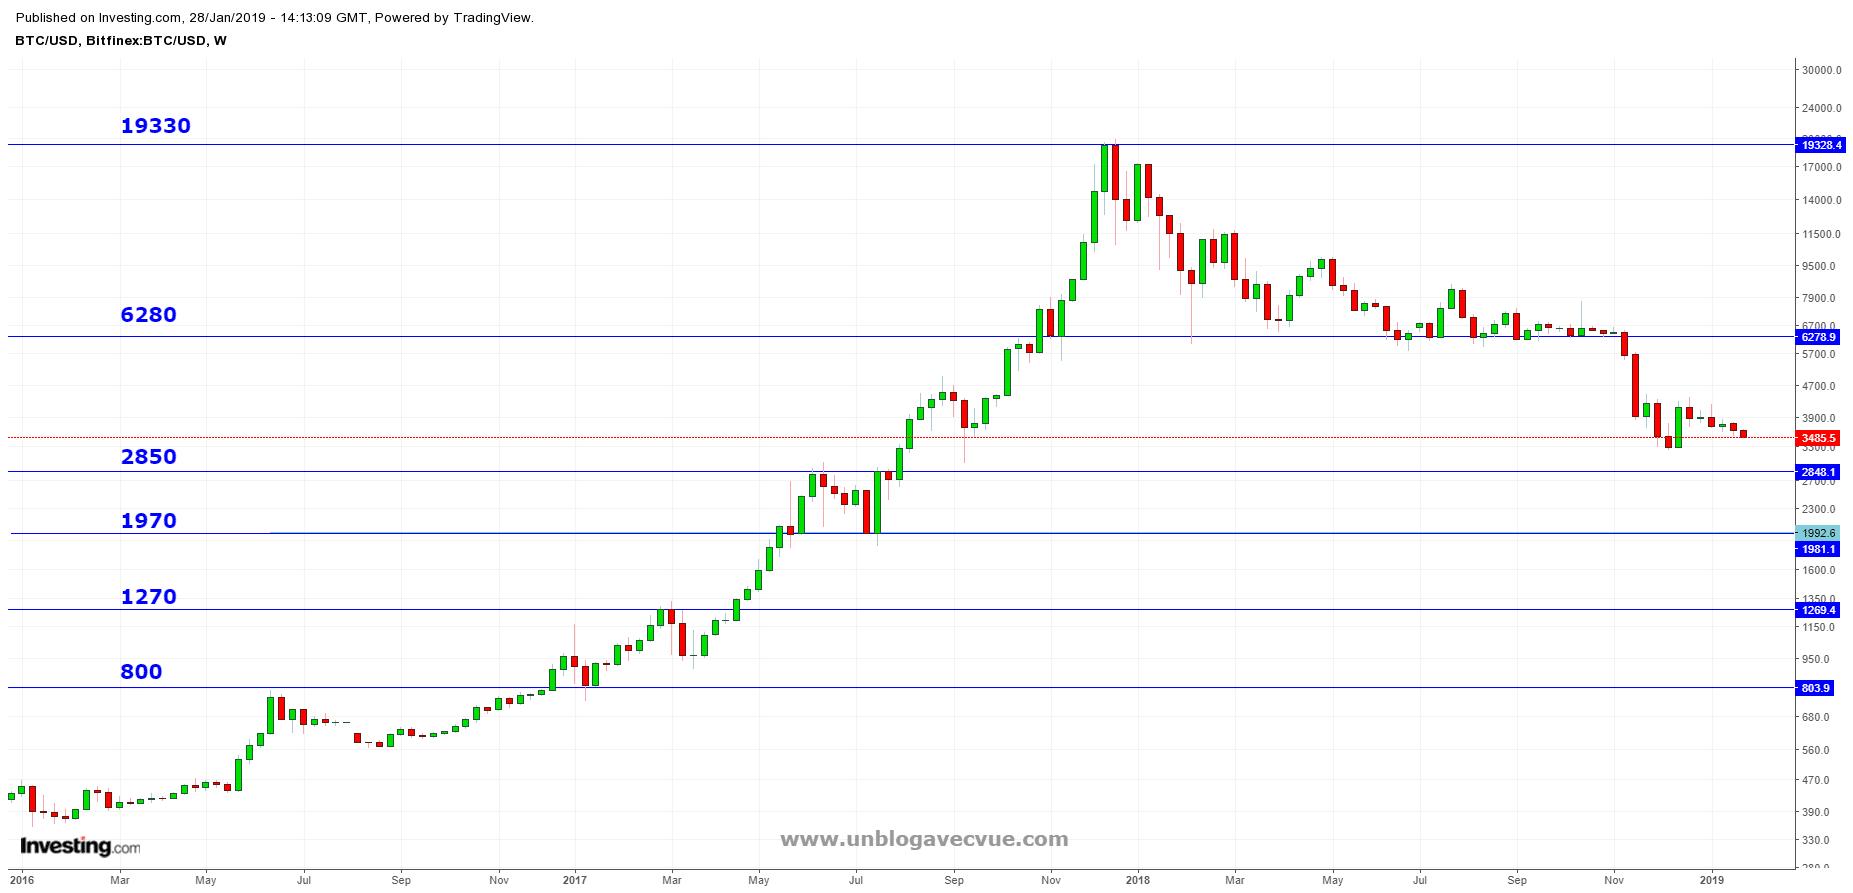 BTC/USD, log scale